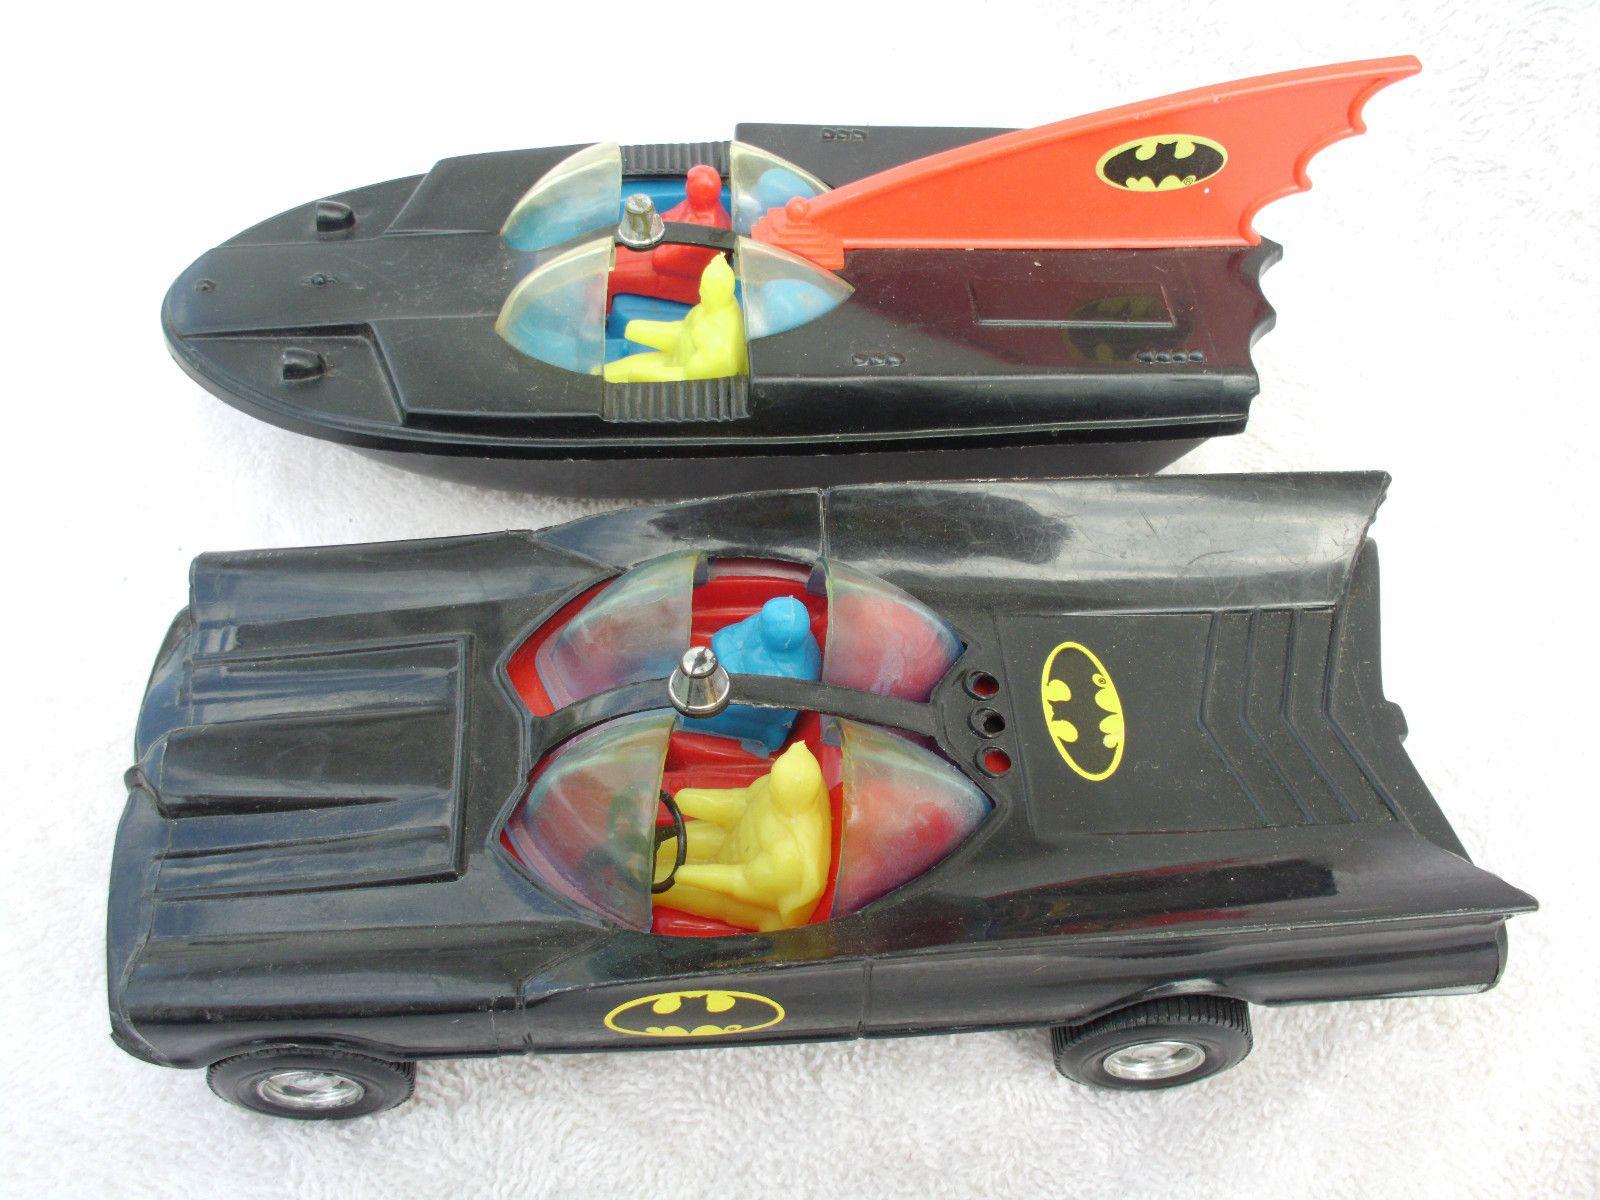 1970 S Toys : Old vintage s batman toy batmobile batboat